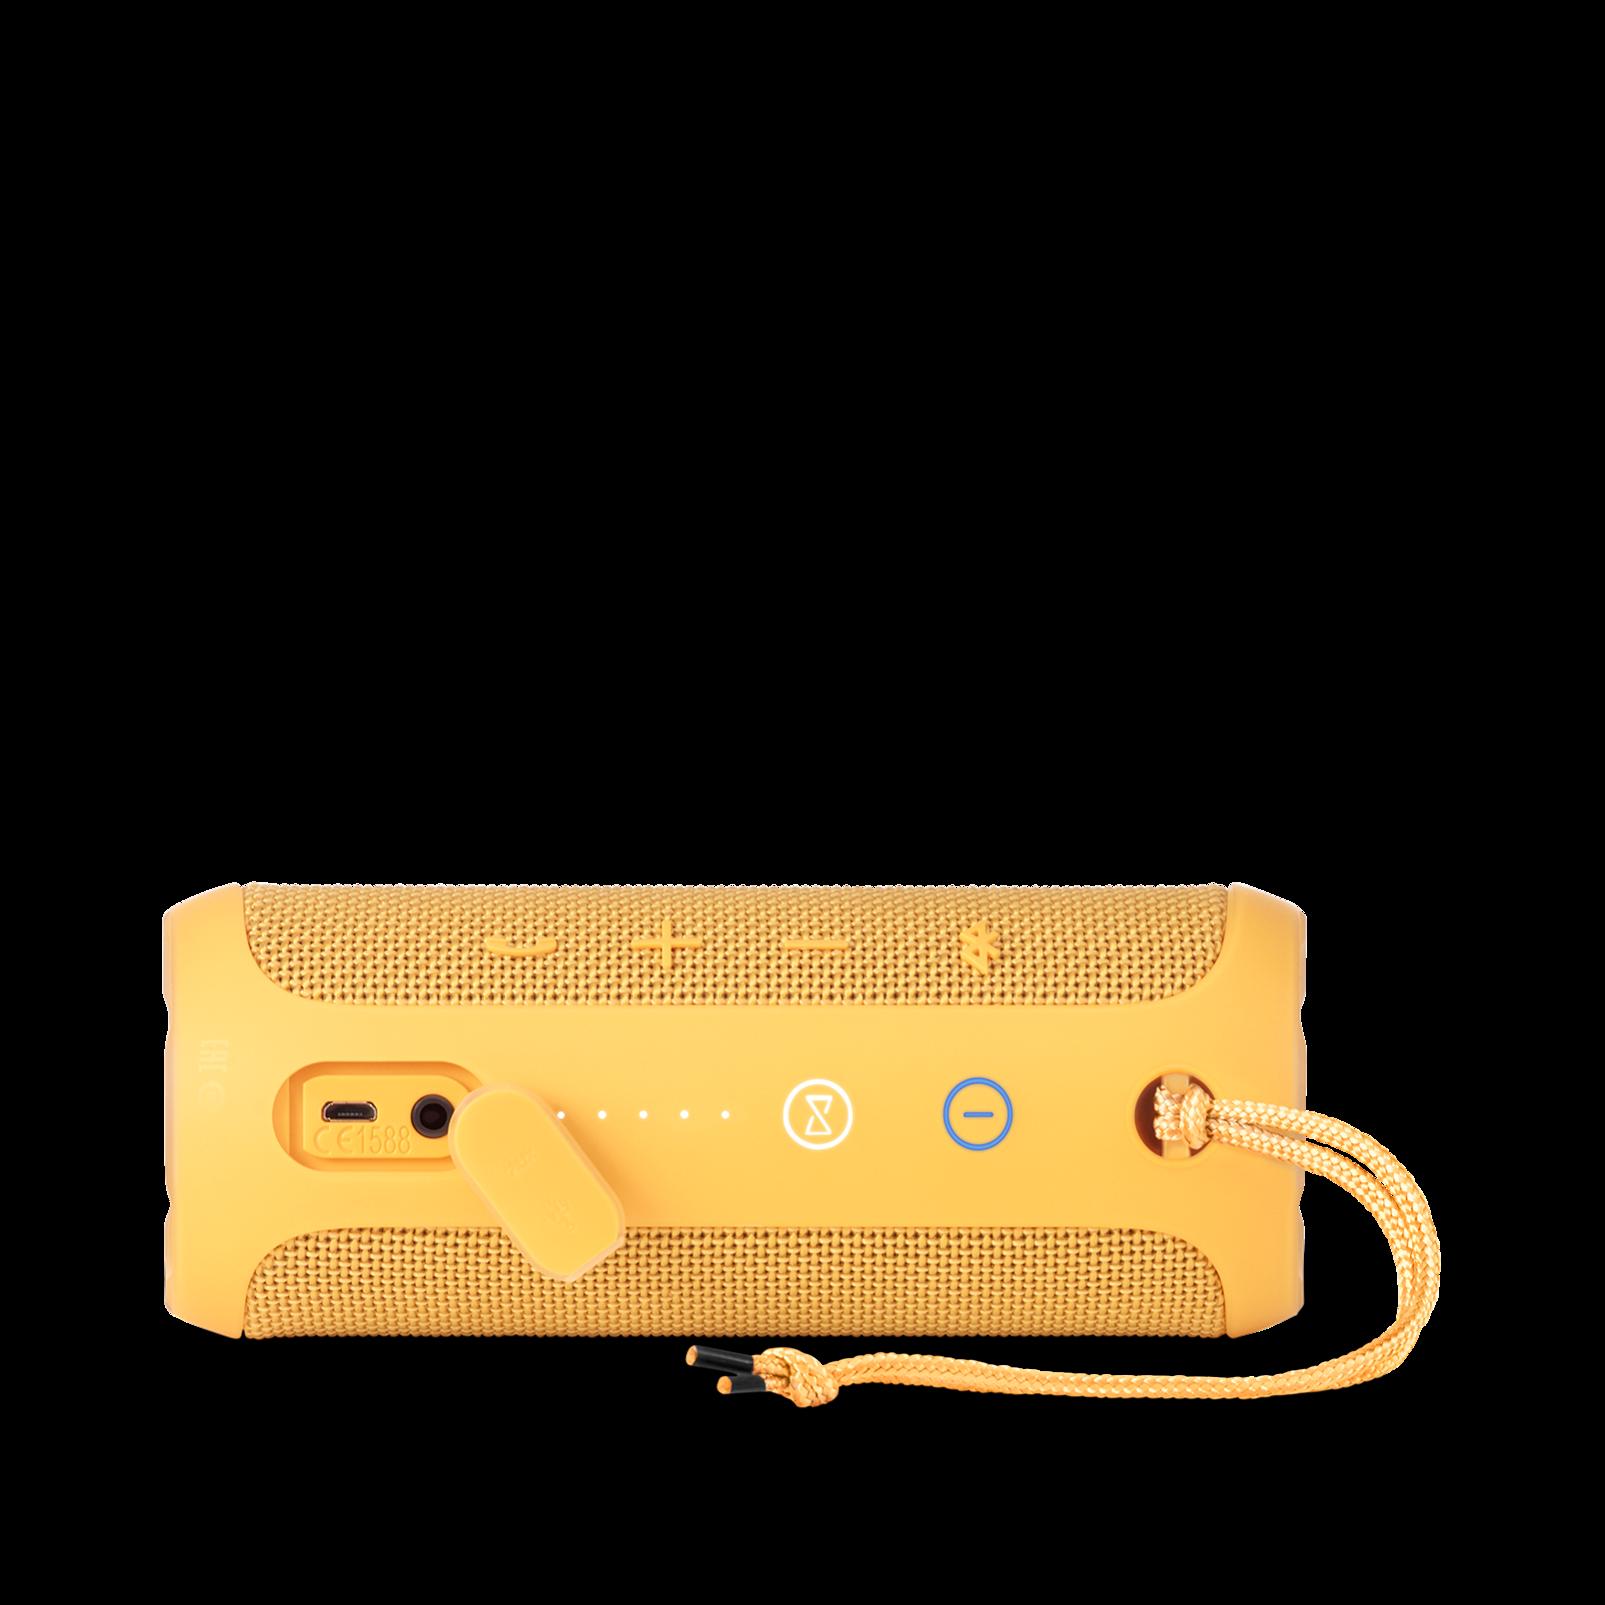 JBL Flip 3 - Yellow - Splashproof portable Bluetooth speaker with powerful sound and speakerphone technology - Detailshot 3